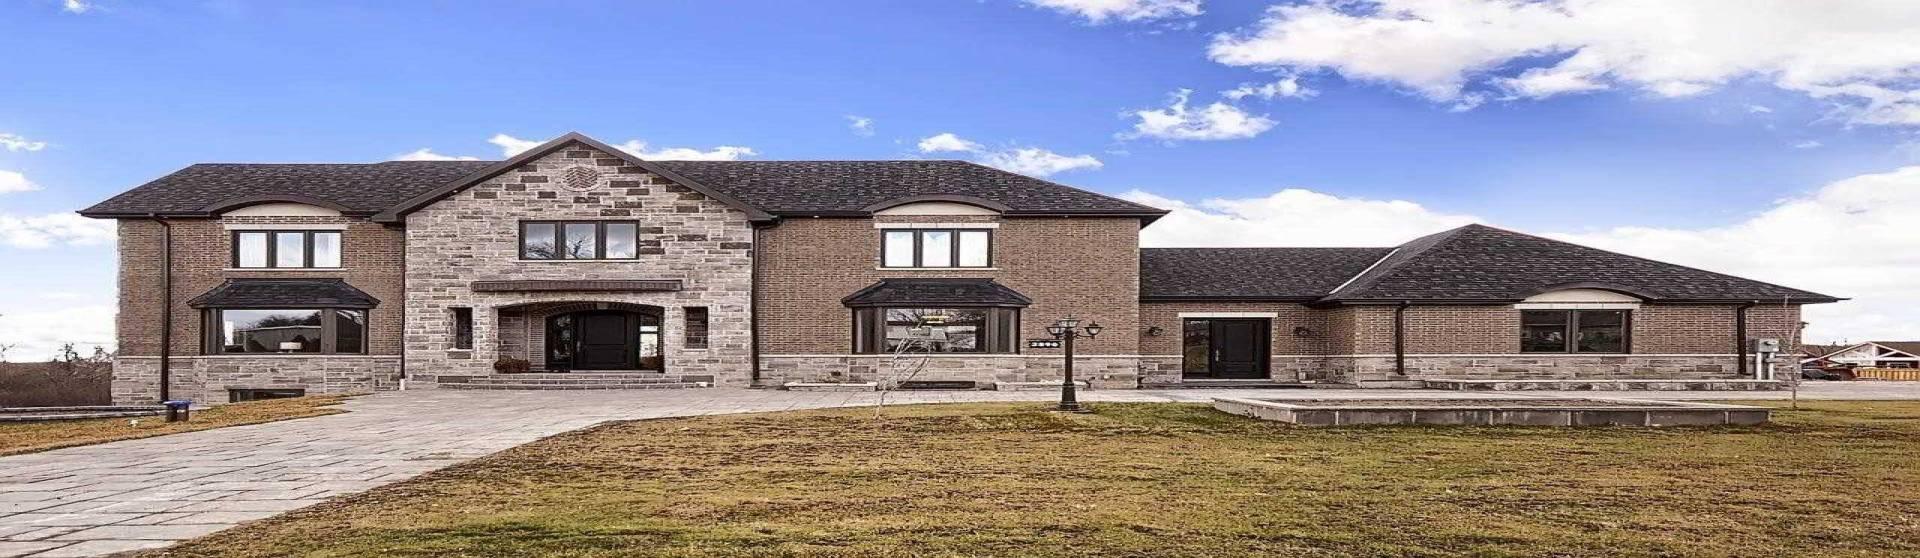 3890 Kinsale Rd- Pickering- Ontario L1Y1E2, 4 Bedrooms Bedrooms, 9 Rooms Rooms,6 BathroomsBathrooms,Detached,Sale,Kinsale,E4813132